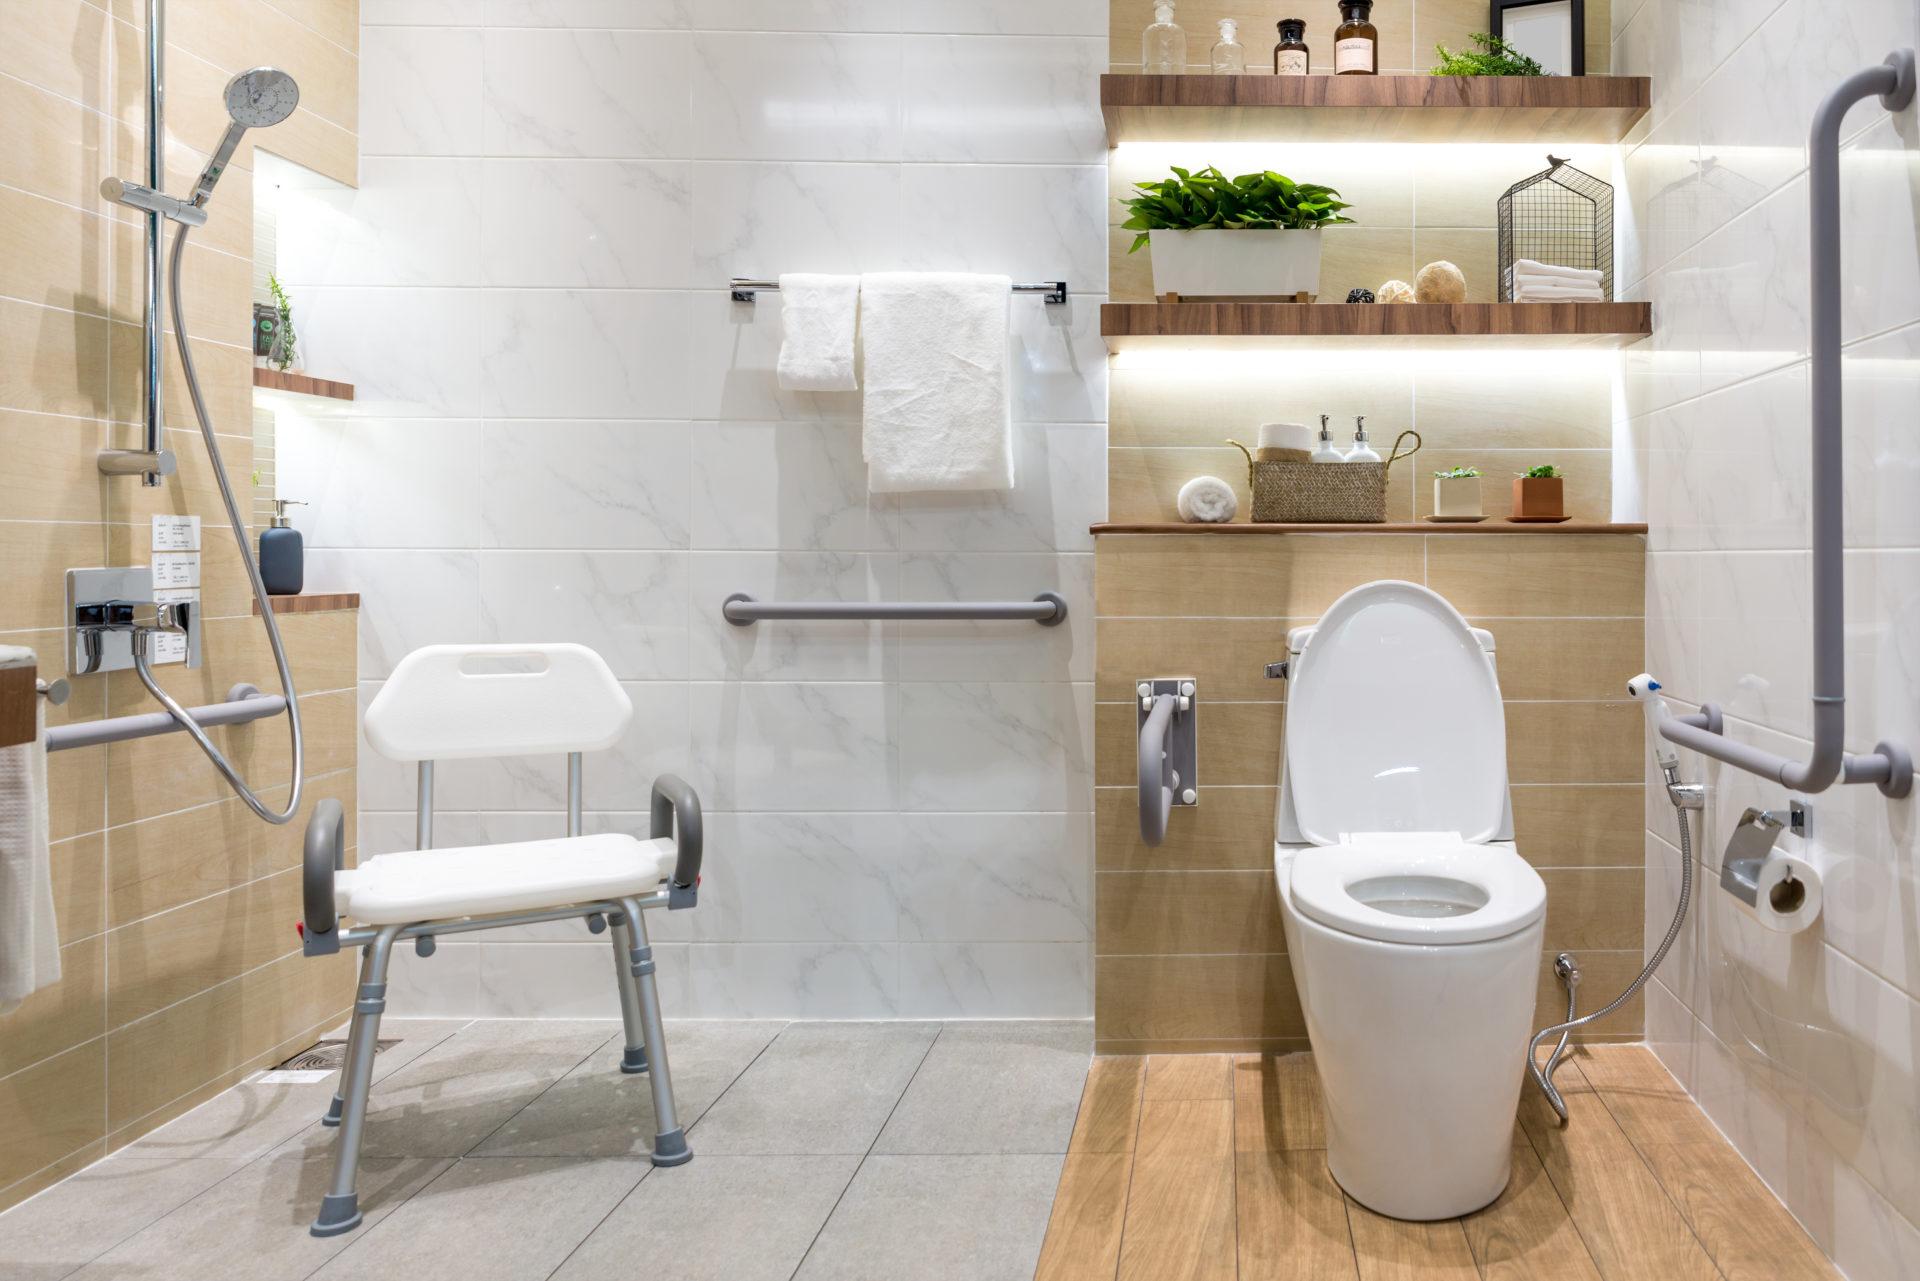 10 Ways to make your bathroom safer for seniors